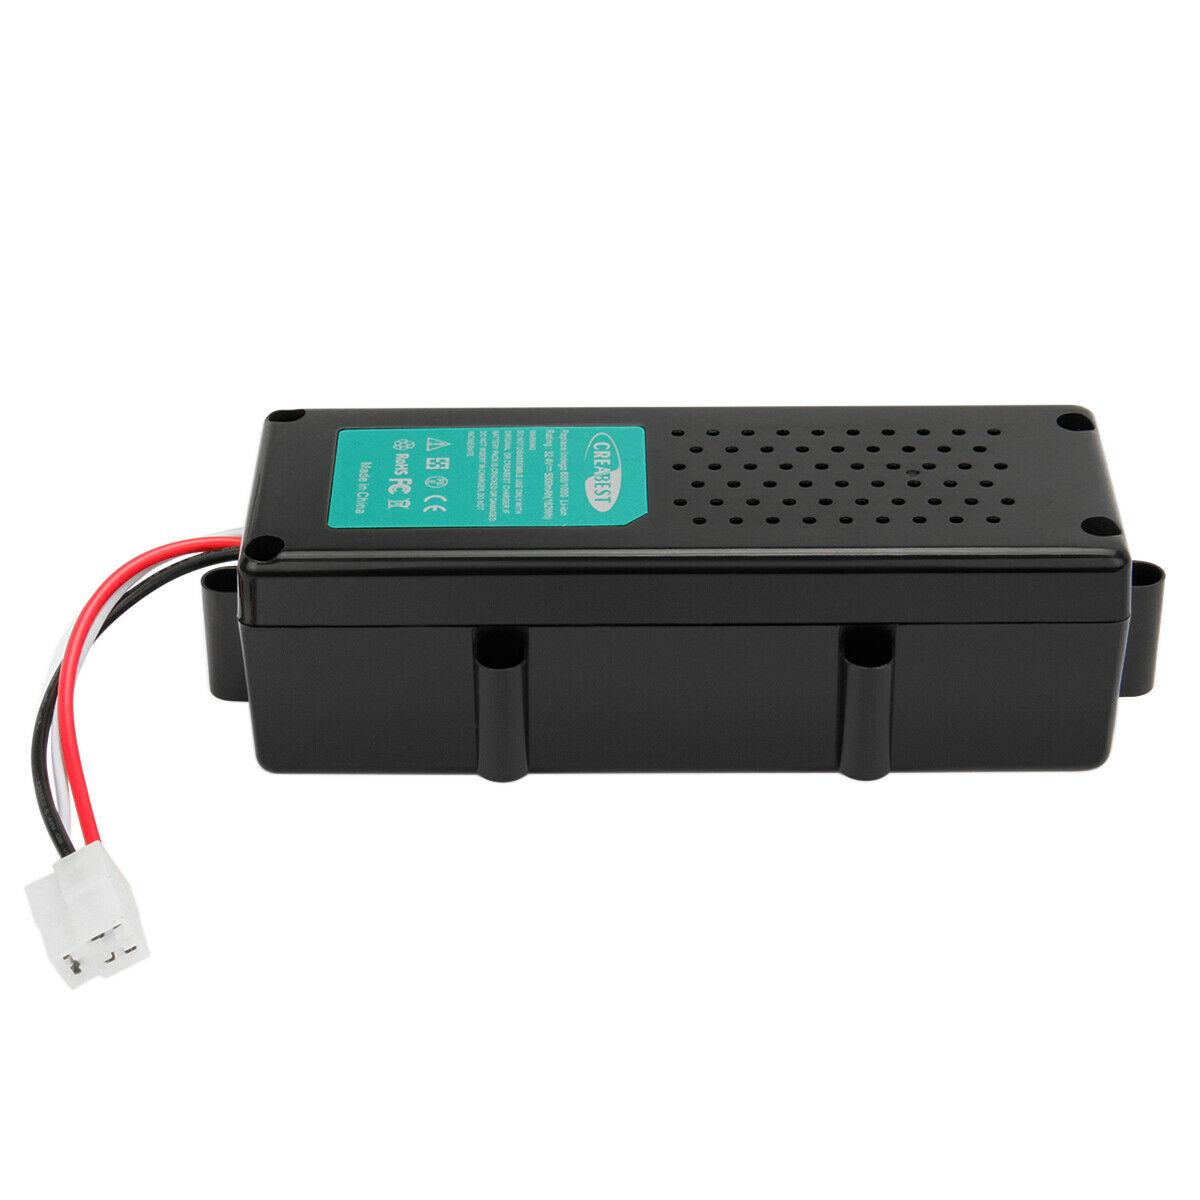 Akku 32.4V 5.0AH Li-ion Bosch Indego 1100,1200,1300,10C,13C,3600 Connect(Ersatz)